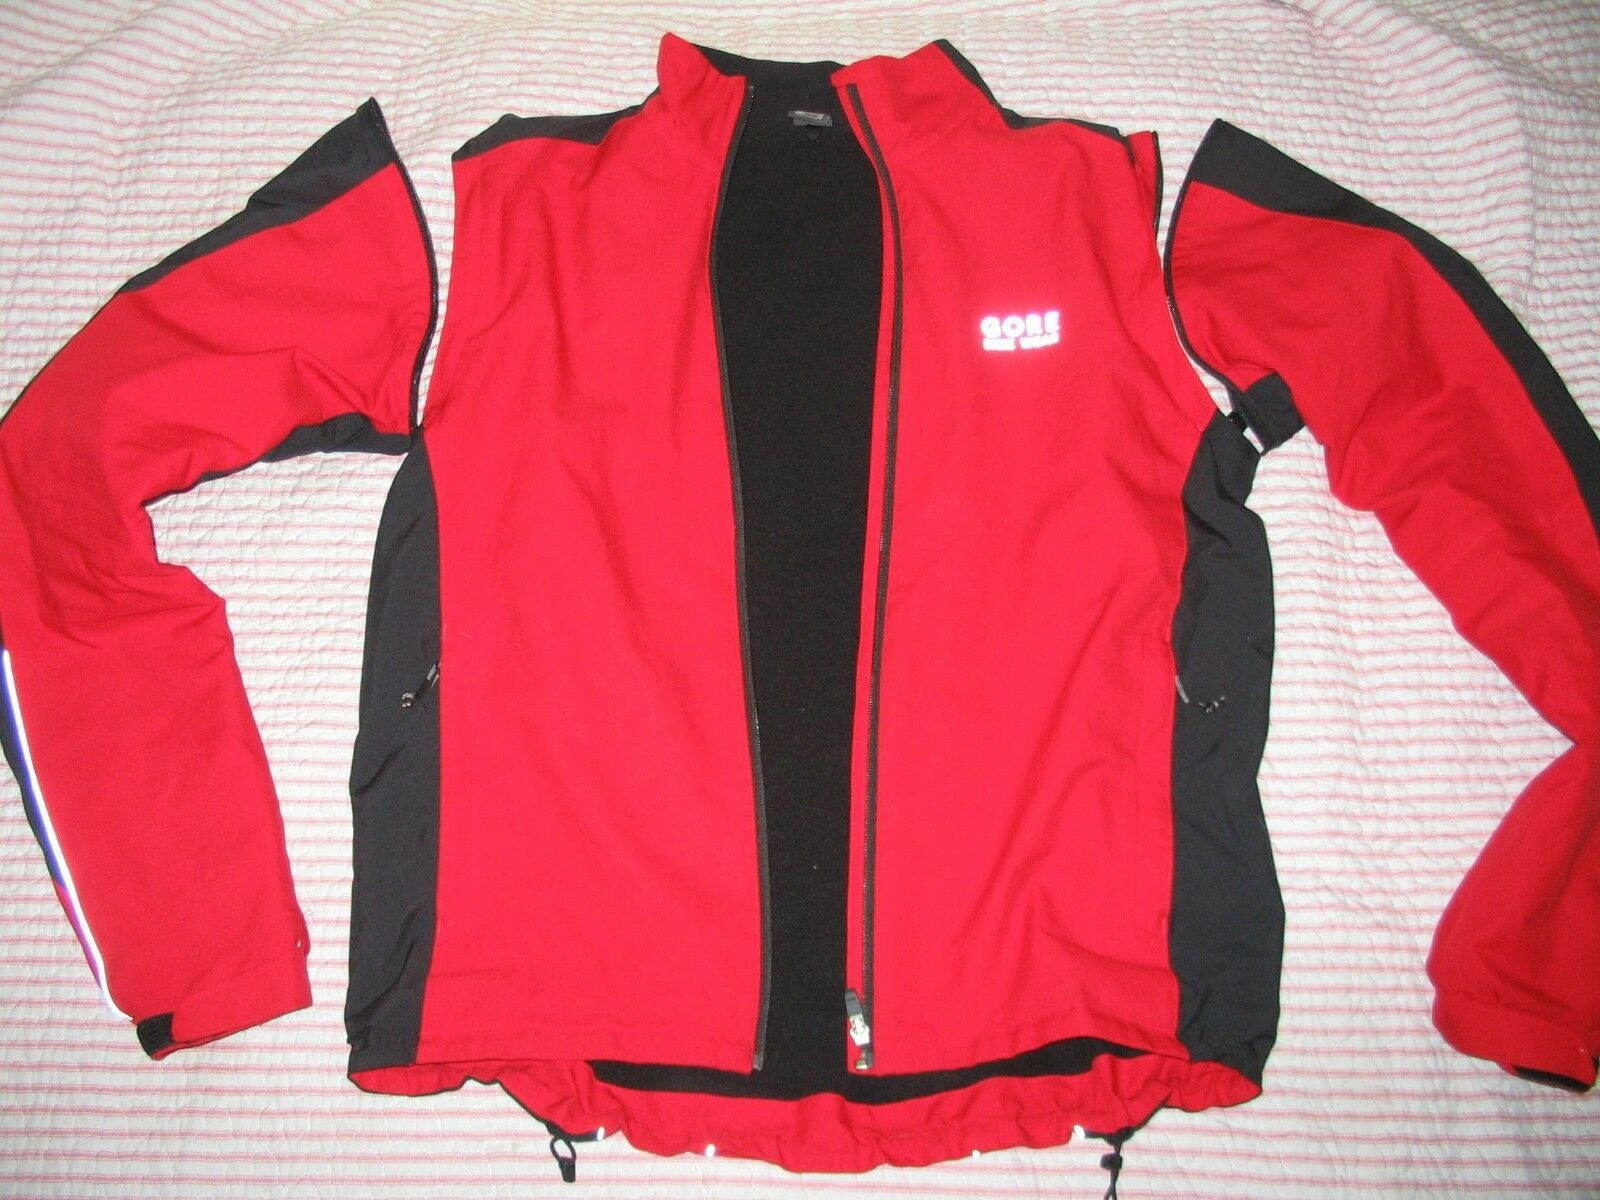 Gore bicicletta wear Jacket zip off Vest Fleece Windstop mtb strada ciclismo rosso L gree